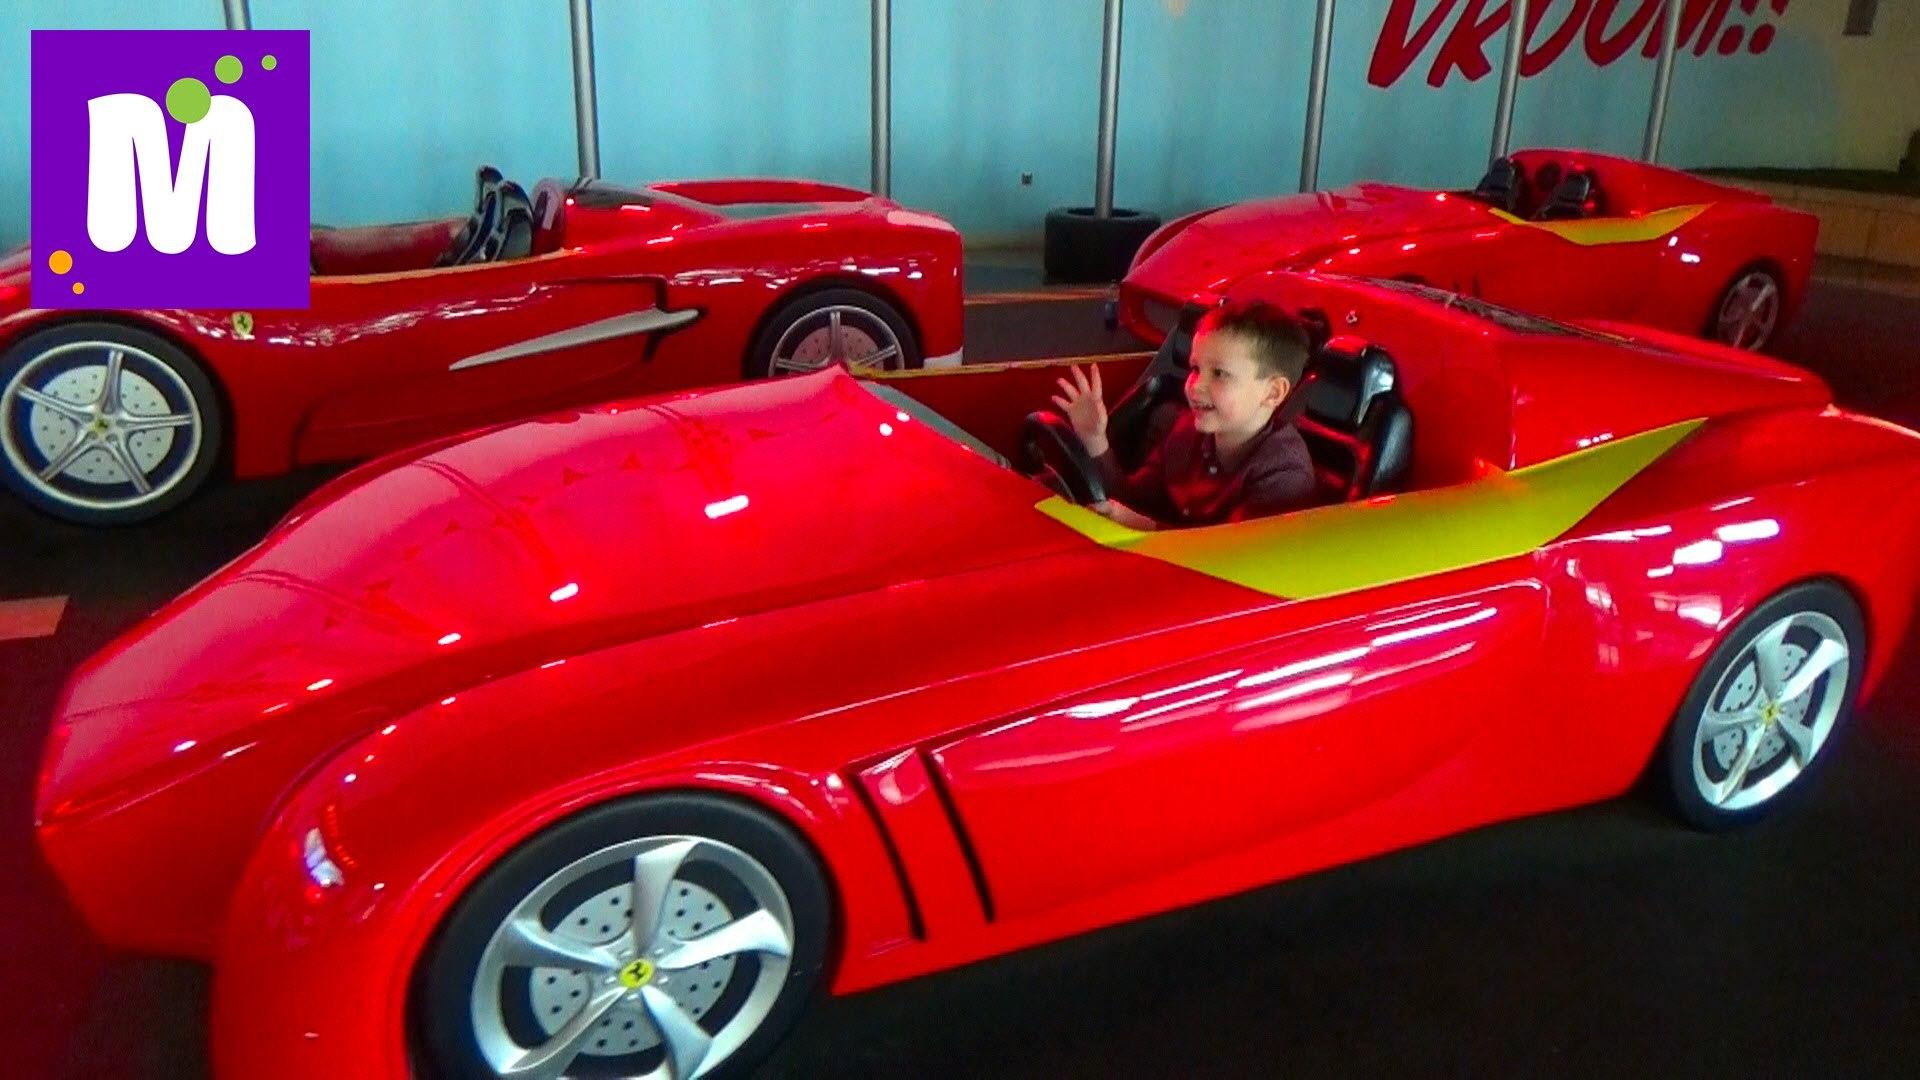 Дубаи #9 День Рождения Макса едем на Феррари в Ферари Ворлд Абу Даби Ferrari World Abu Dabi